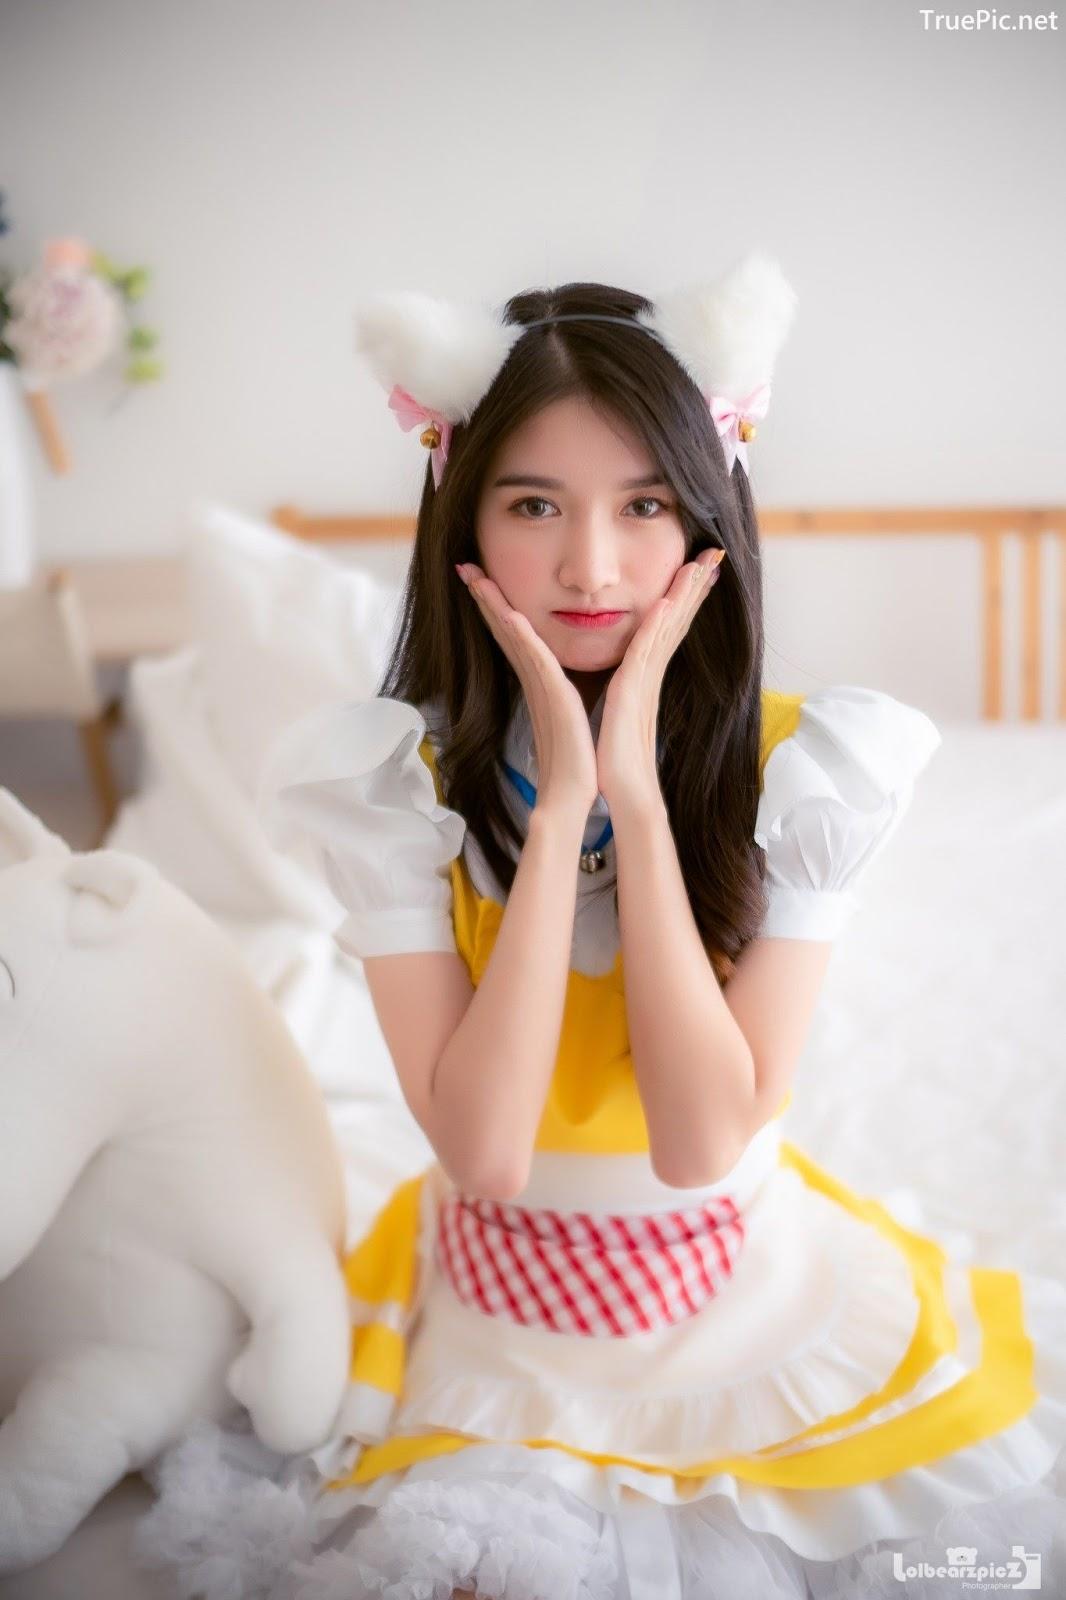 Image Thailand Model - Yatawee Limsiripothong - Cute Maid - TruePic.net - Picture-8